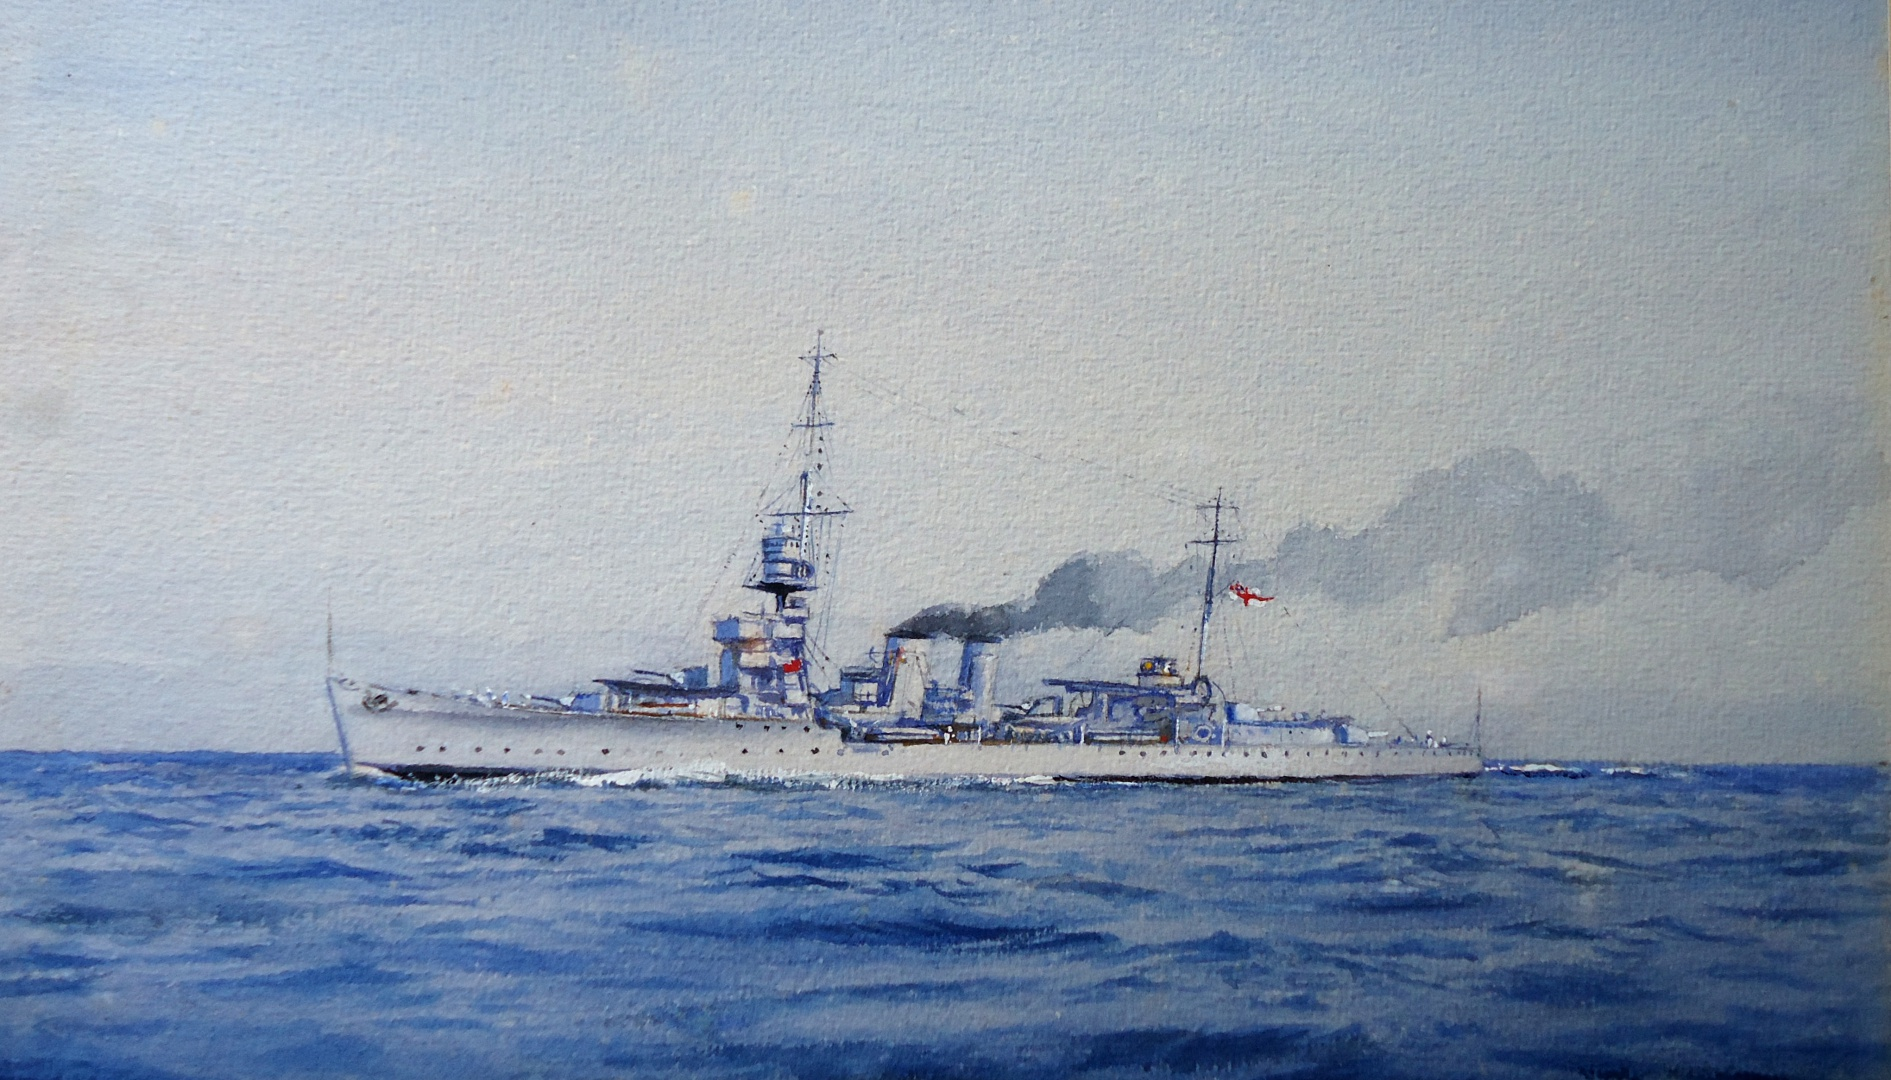 C Class cruiser c. 1920-30